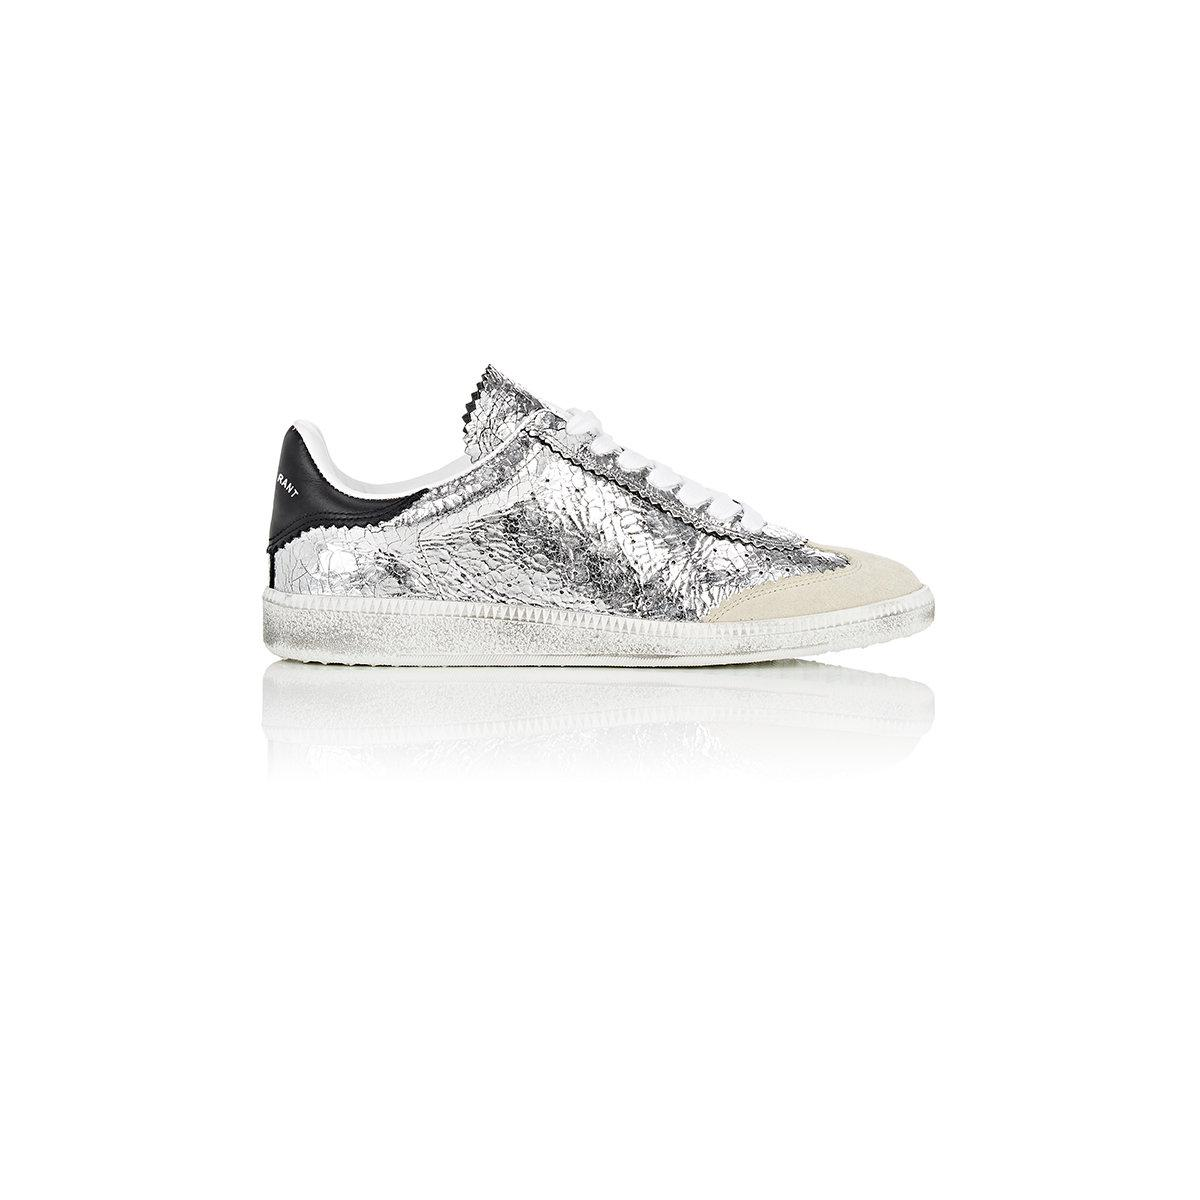 Craquelé Isabel Marant Beth Lyst Leather Sneakers 1TKcFlJ